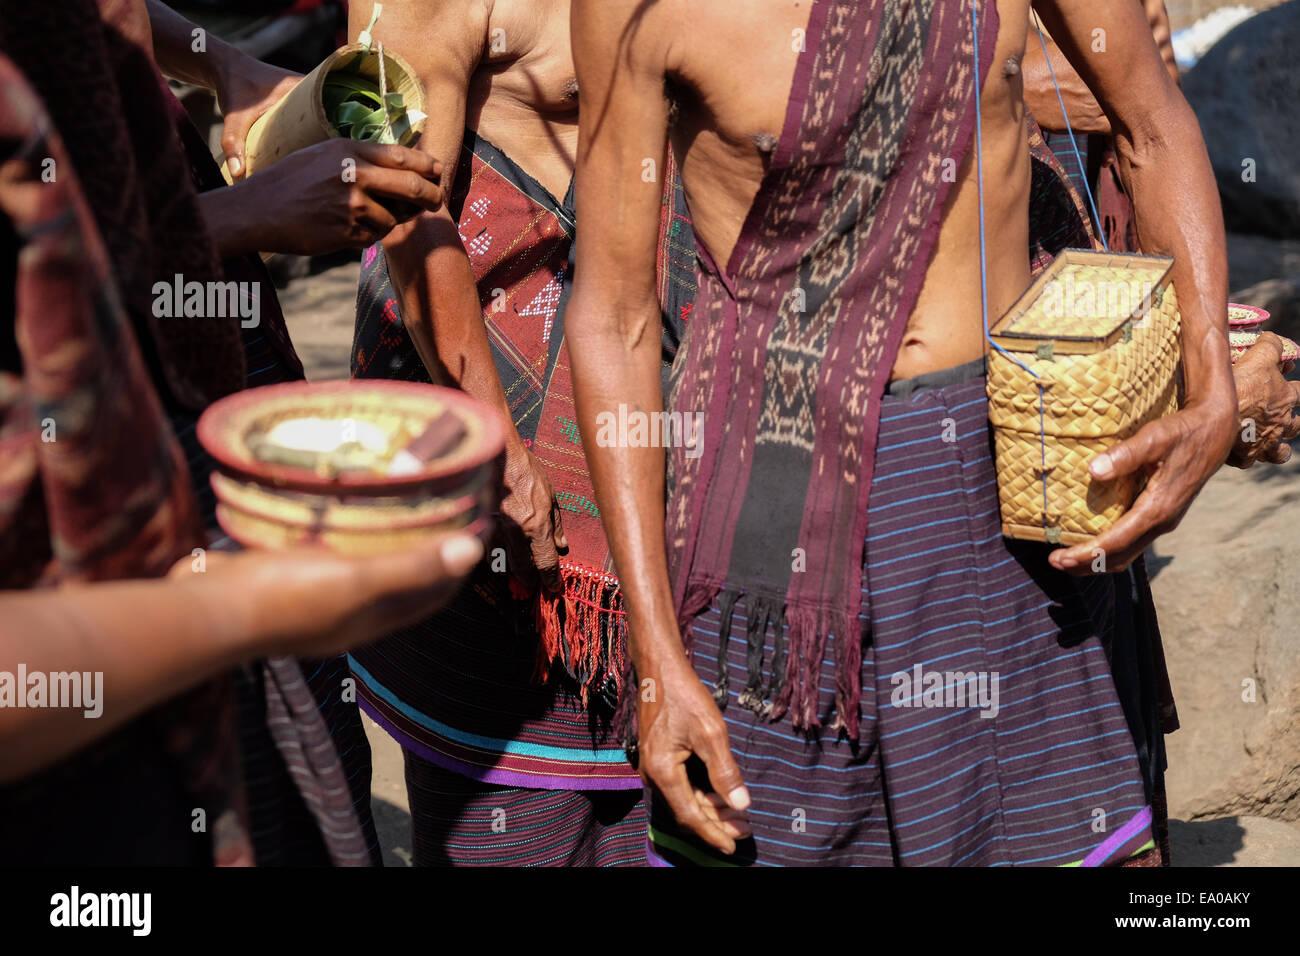 Local people bring small baskets containing betel and Areca (sirih and pinang) in Lamagute, Lembata, Indonesia. - Stock Image